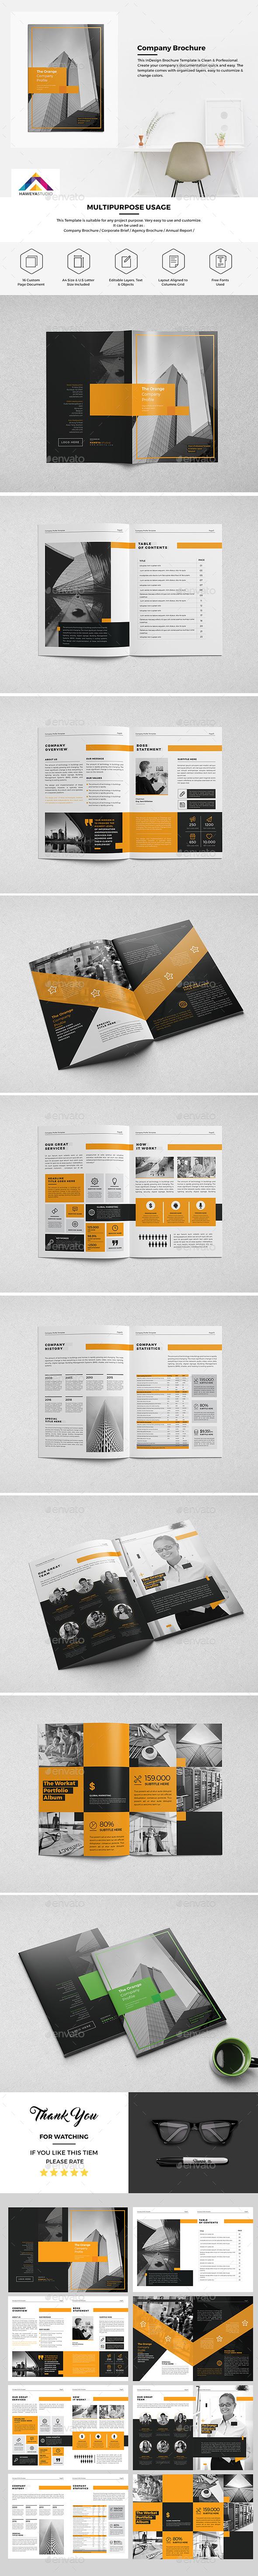 Haweya Company Brochure 16 Page - Corporate Brochures